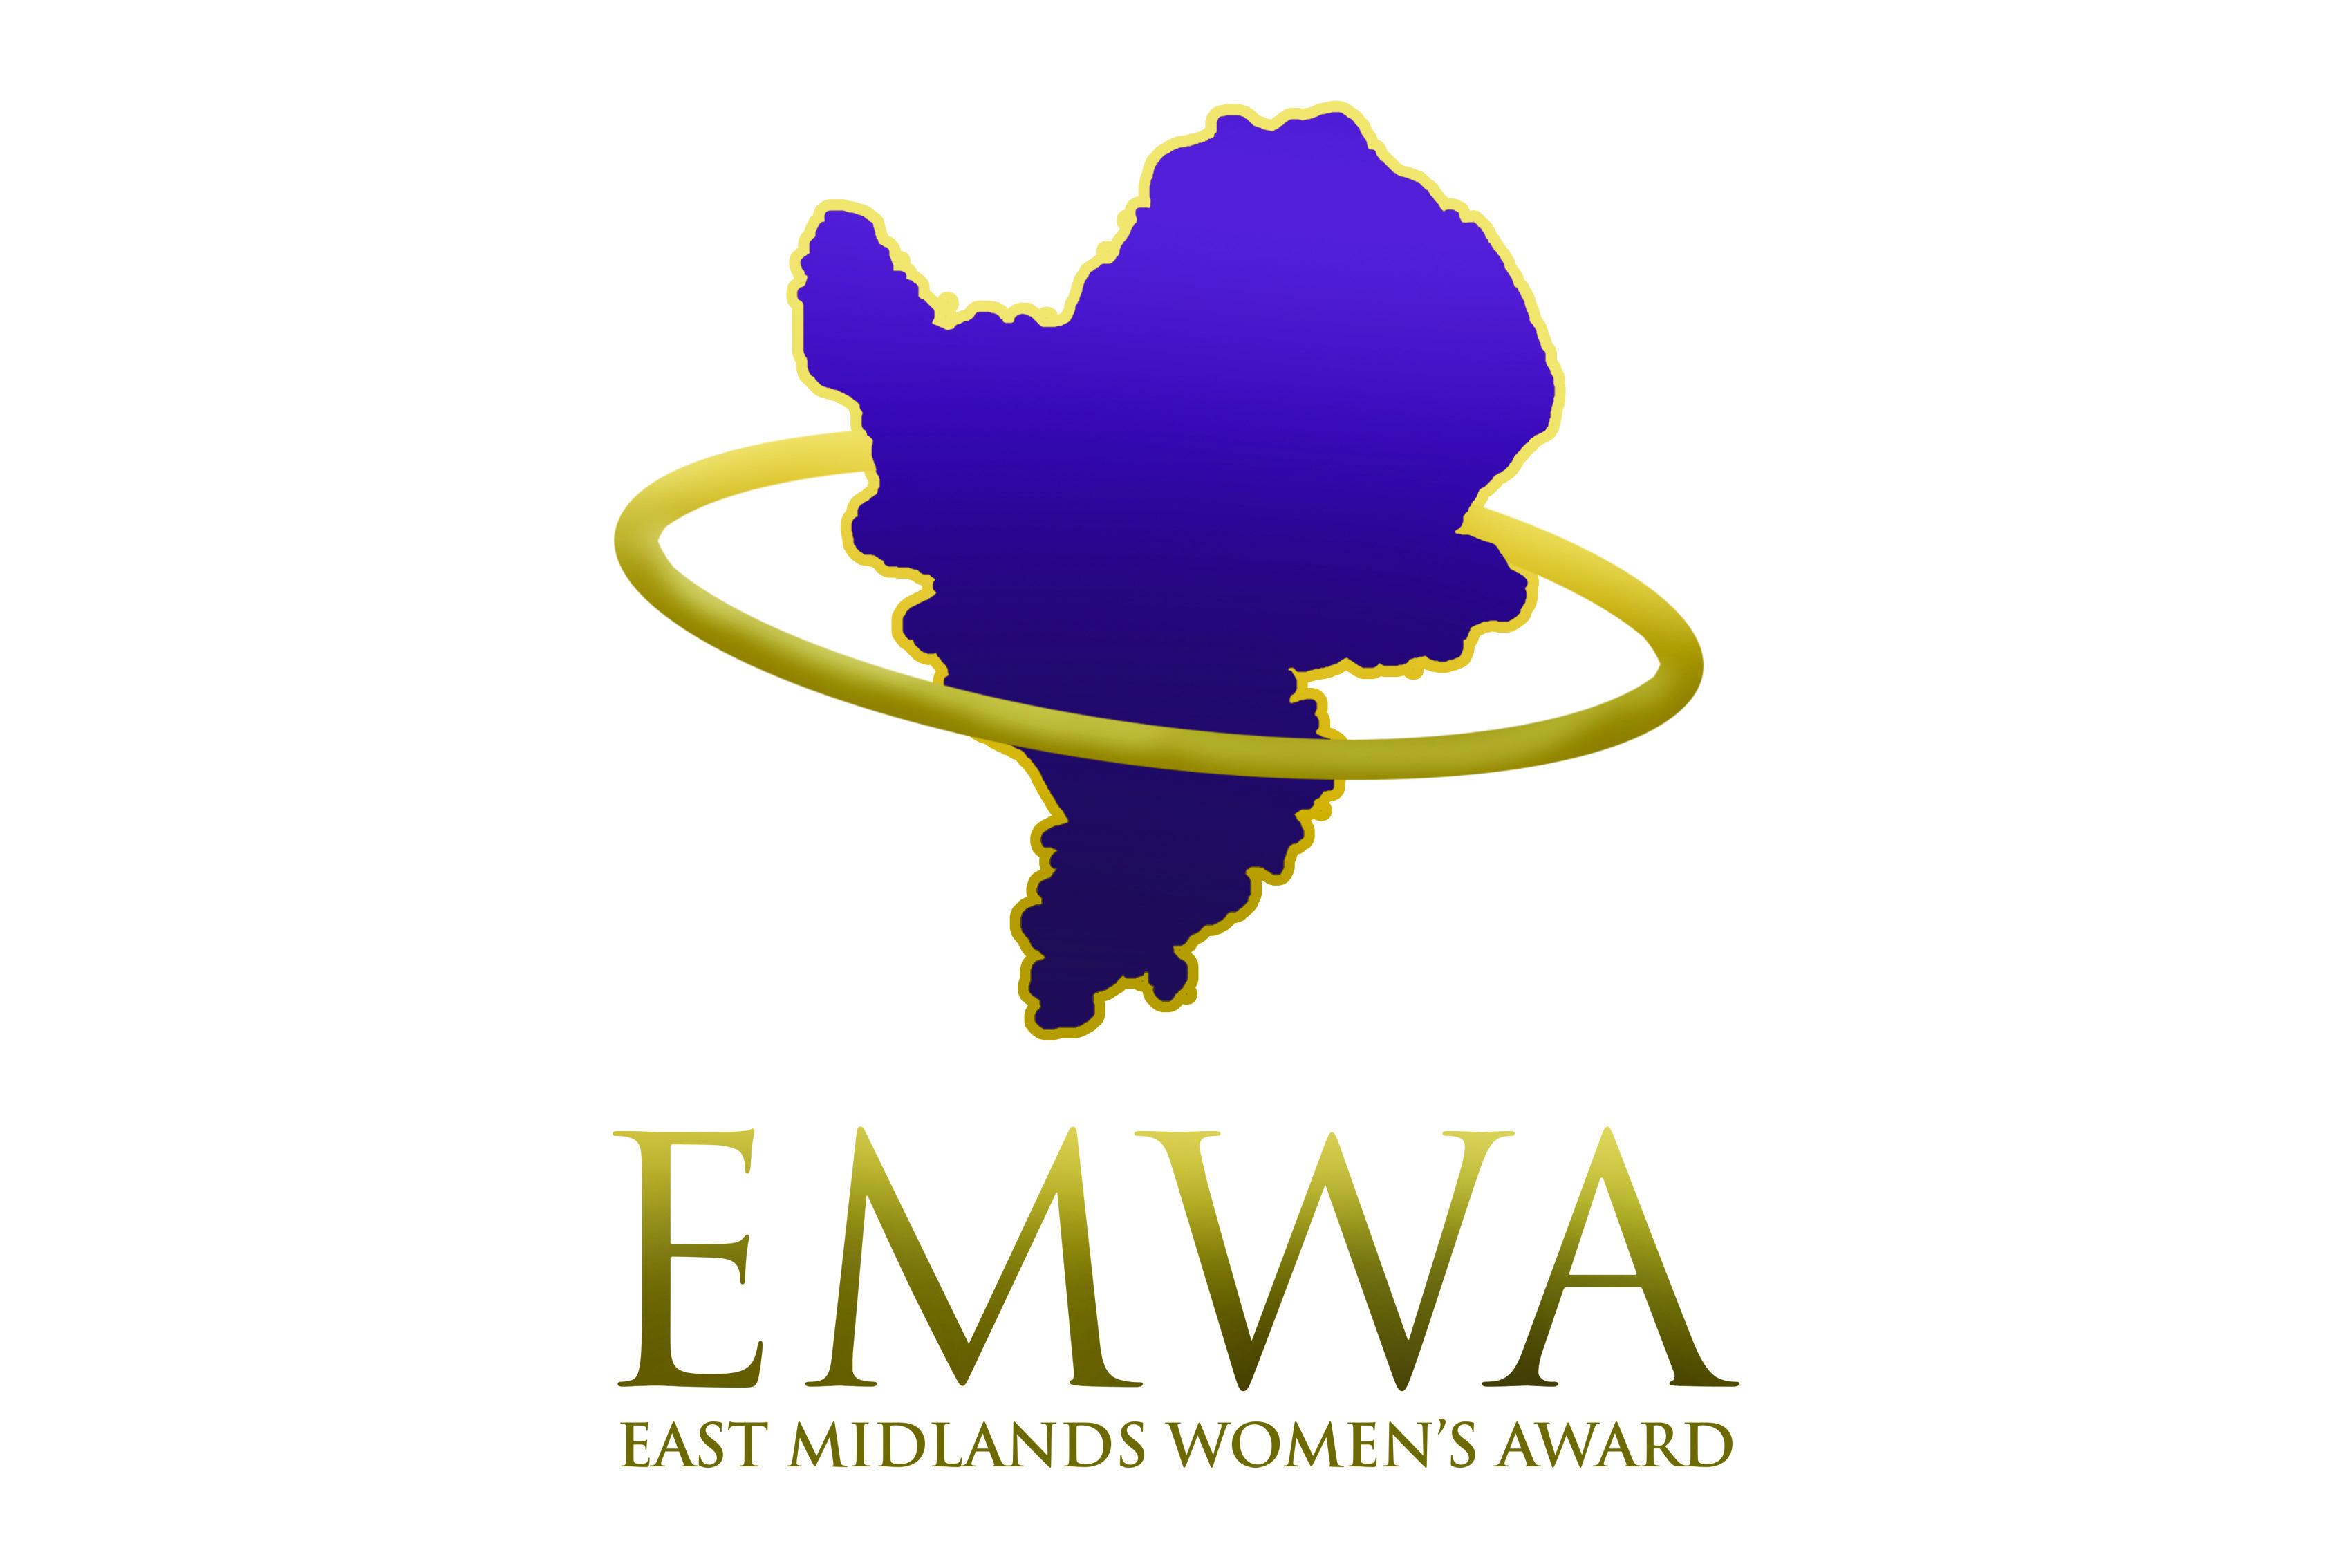 East Midlands Womens Awards